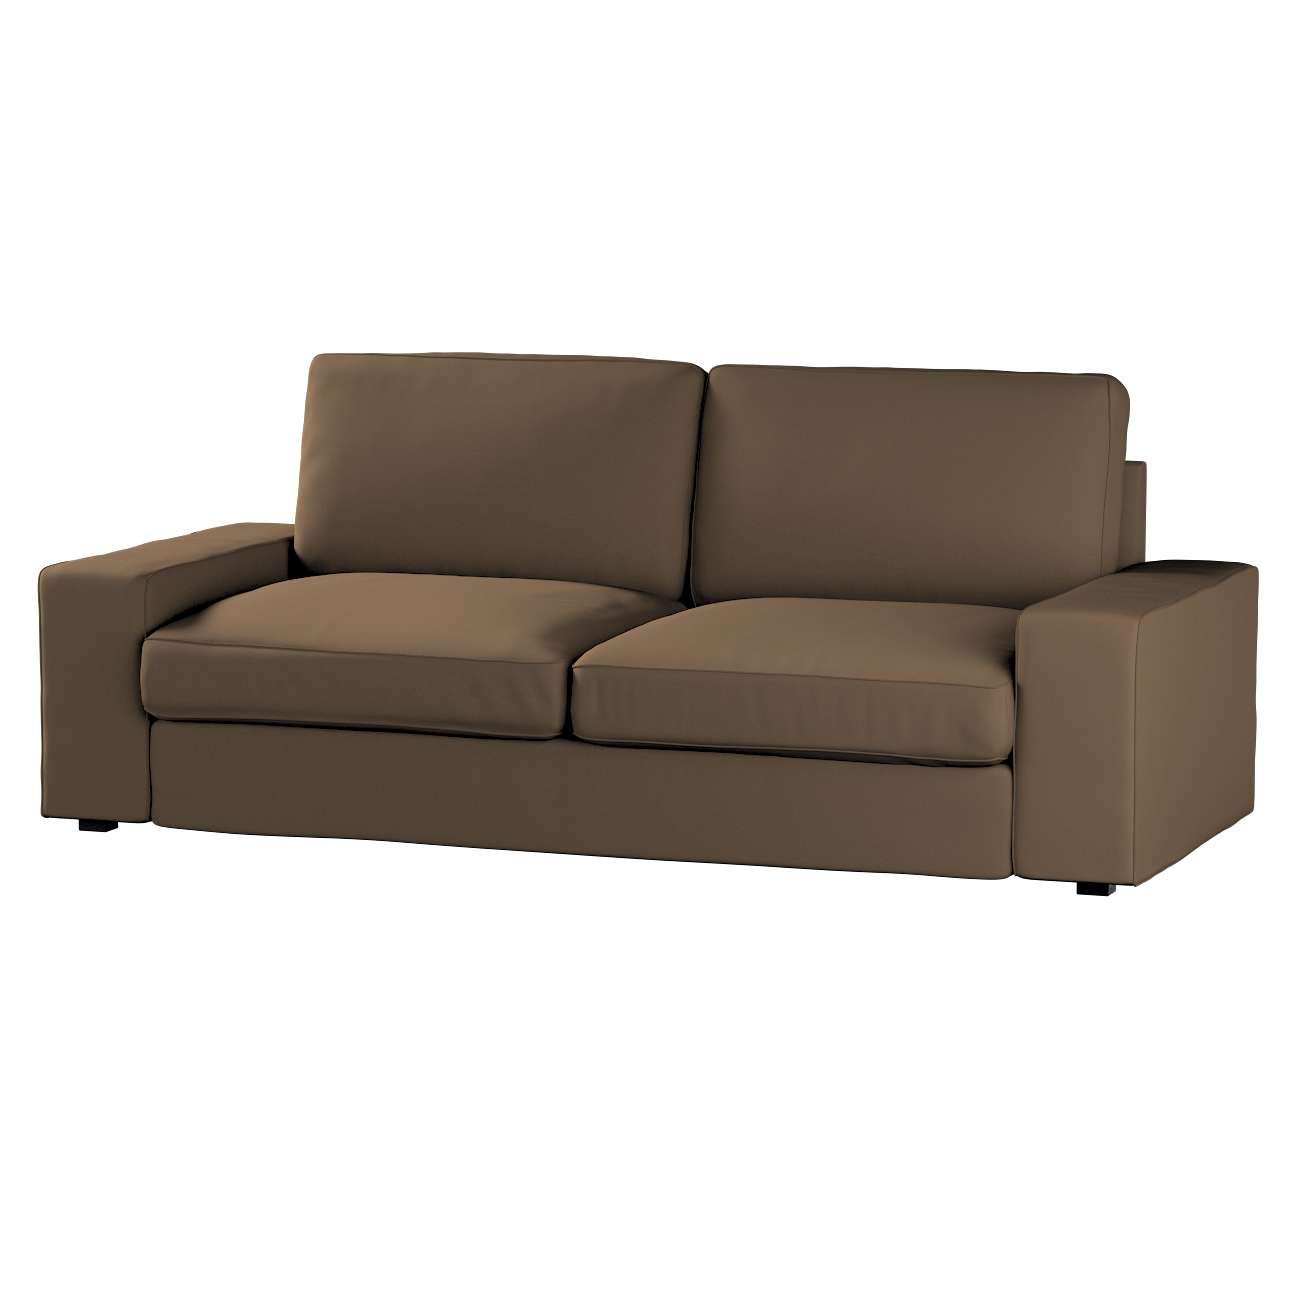 Kivik 3-Sitzer Sofabezug Sofa Kivik 3-Sitzer von der Kollektion Cotton Panama, Stoff: 702-02